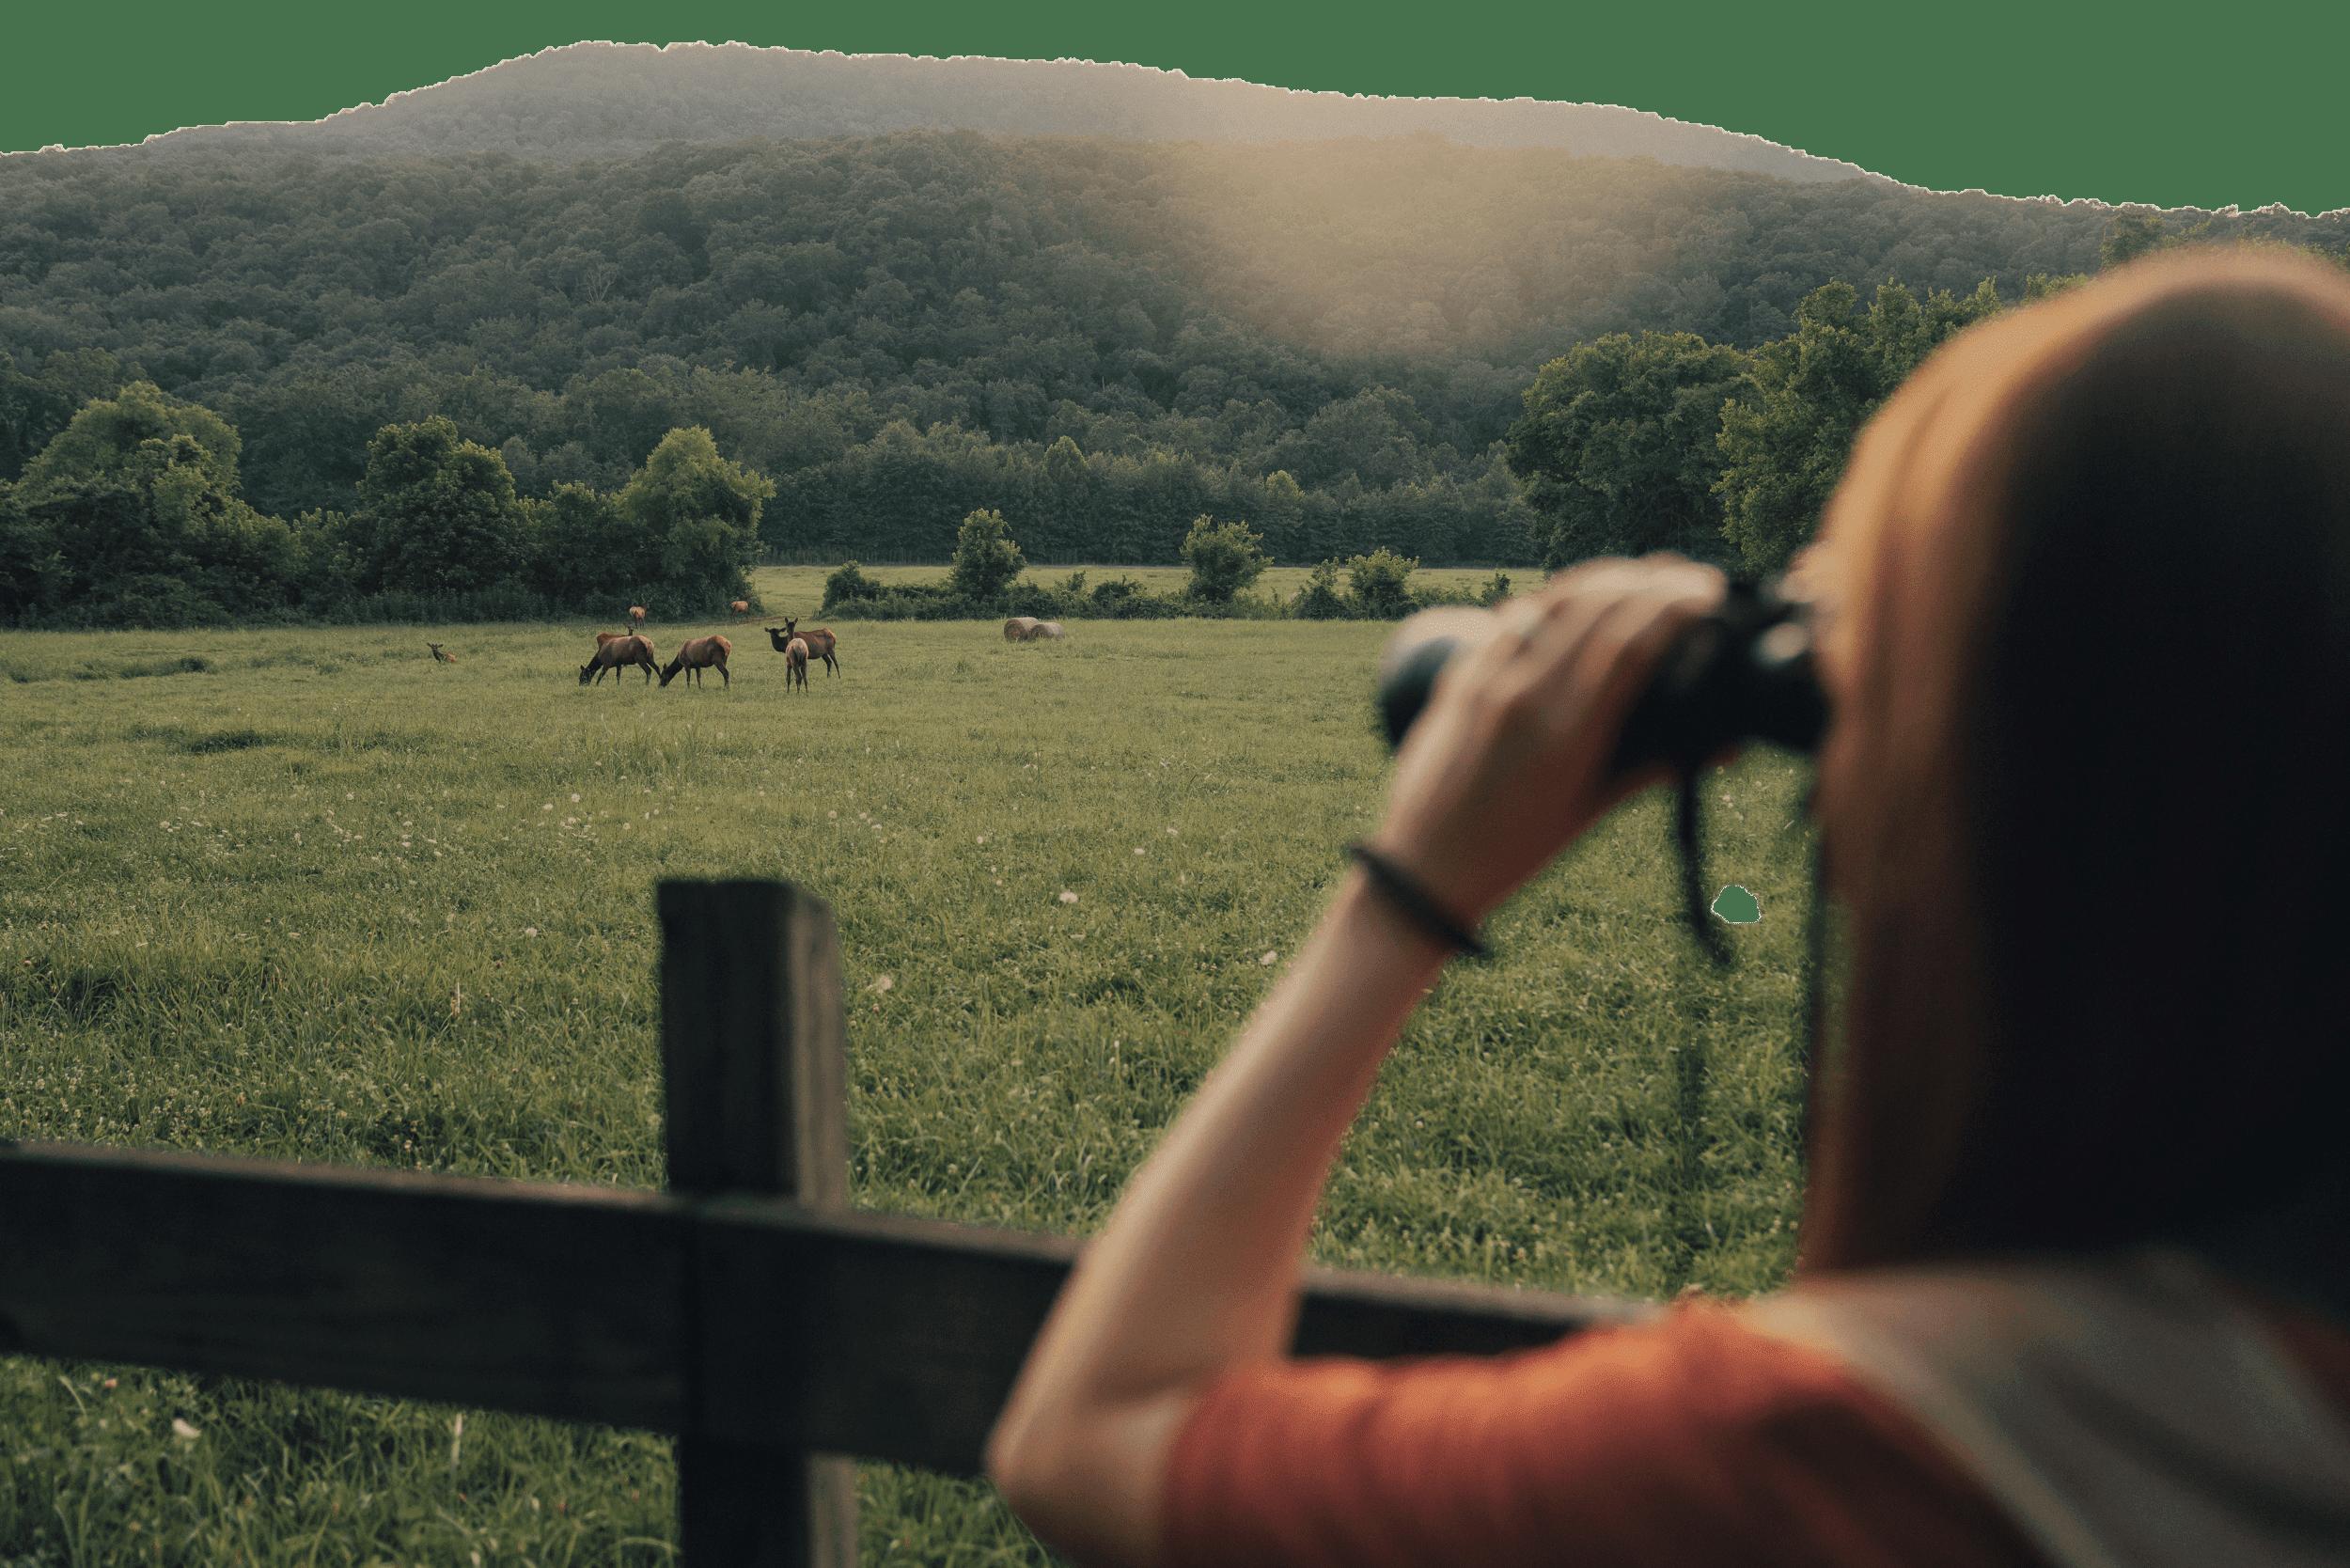 Young girl using binoculars to view wildlife